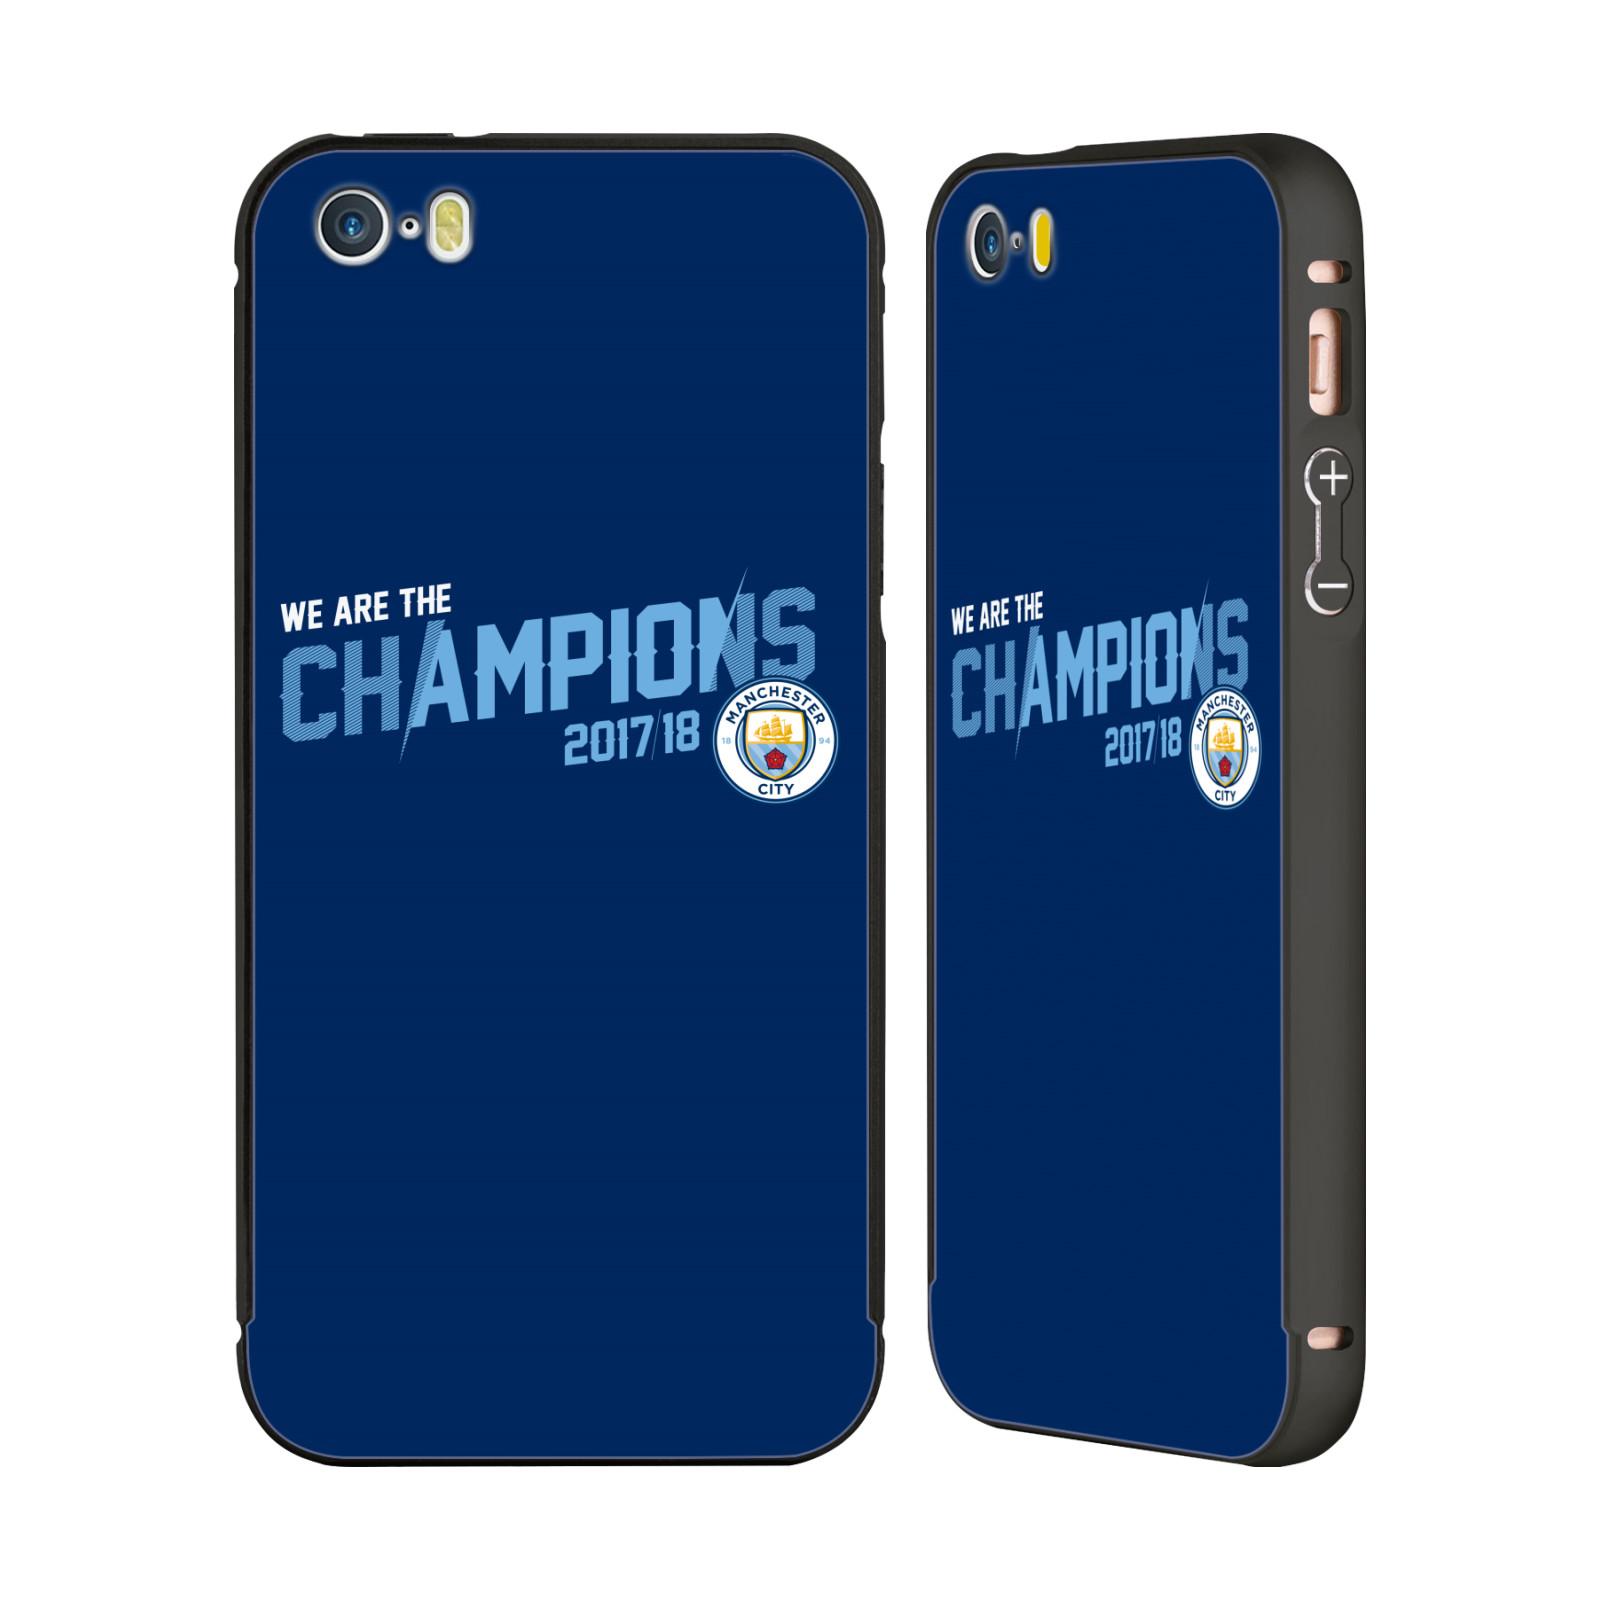 MAN-CITY-FC-2017-18-CHAMPIONS-BLACK-BUMPER-SLIDER-CASE-FOR-APPLE-iPHONE-PHONES